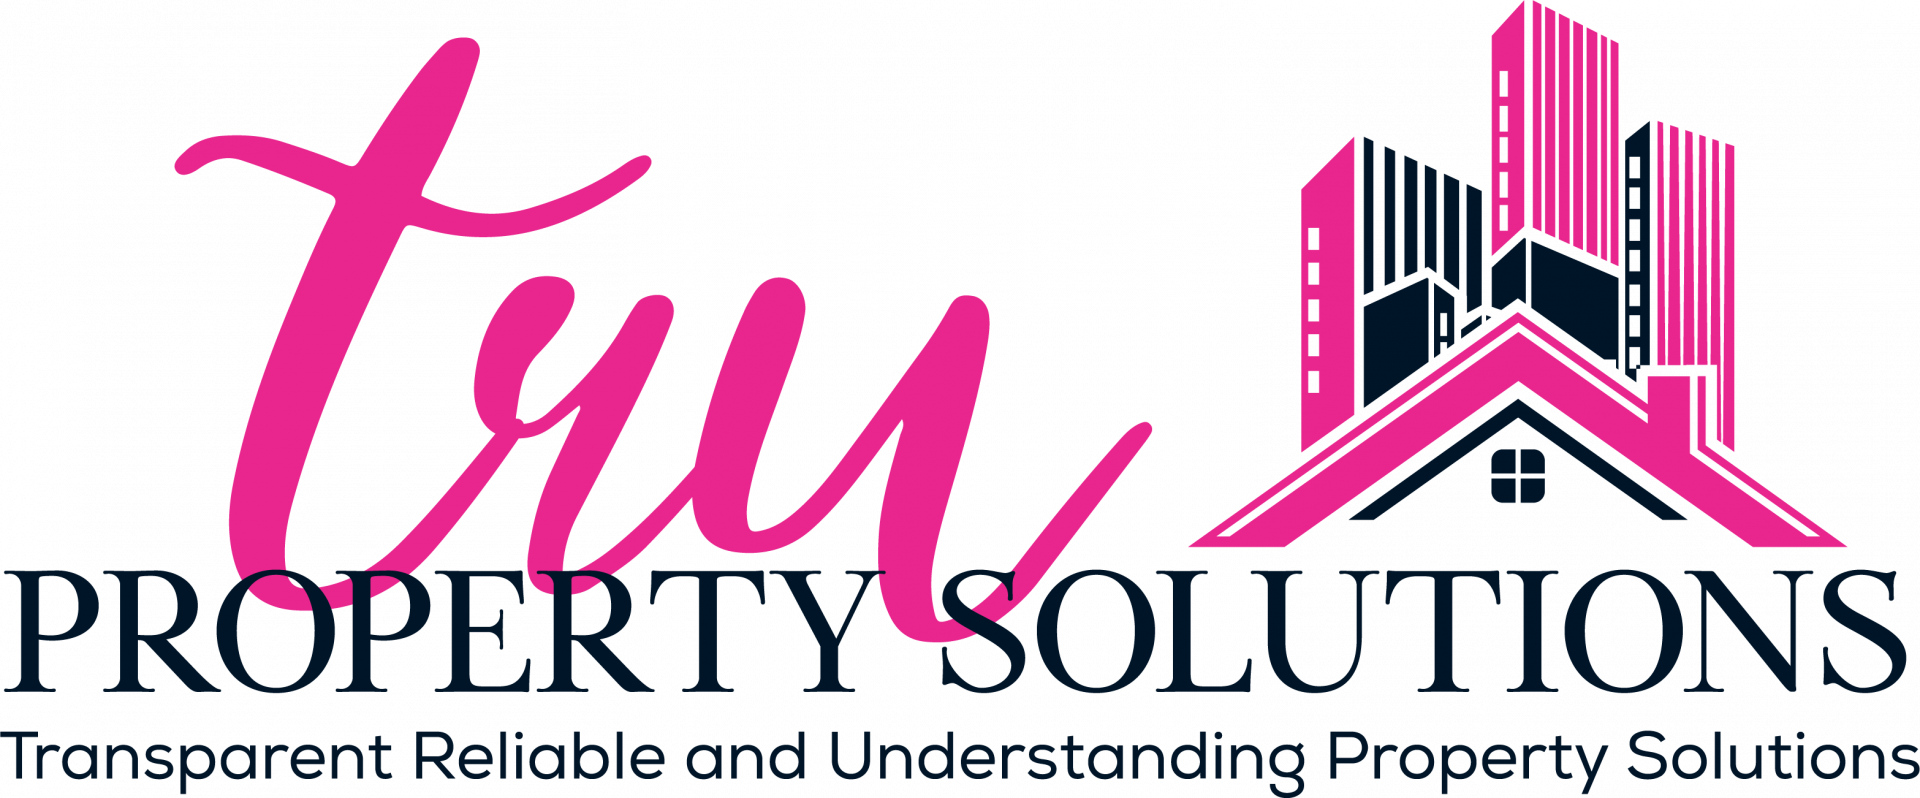 TRU Property Solutions  logo